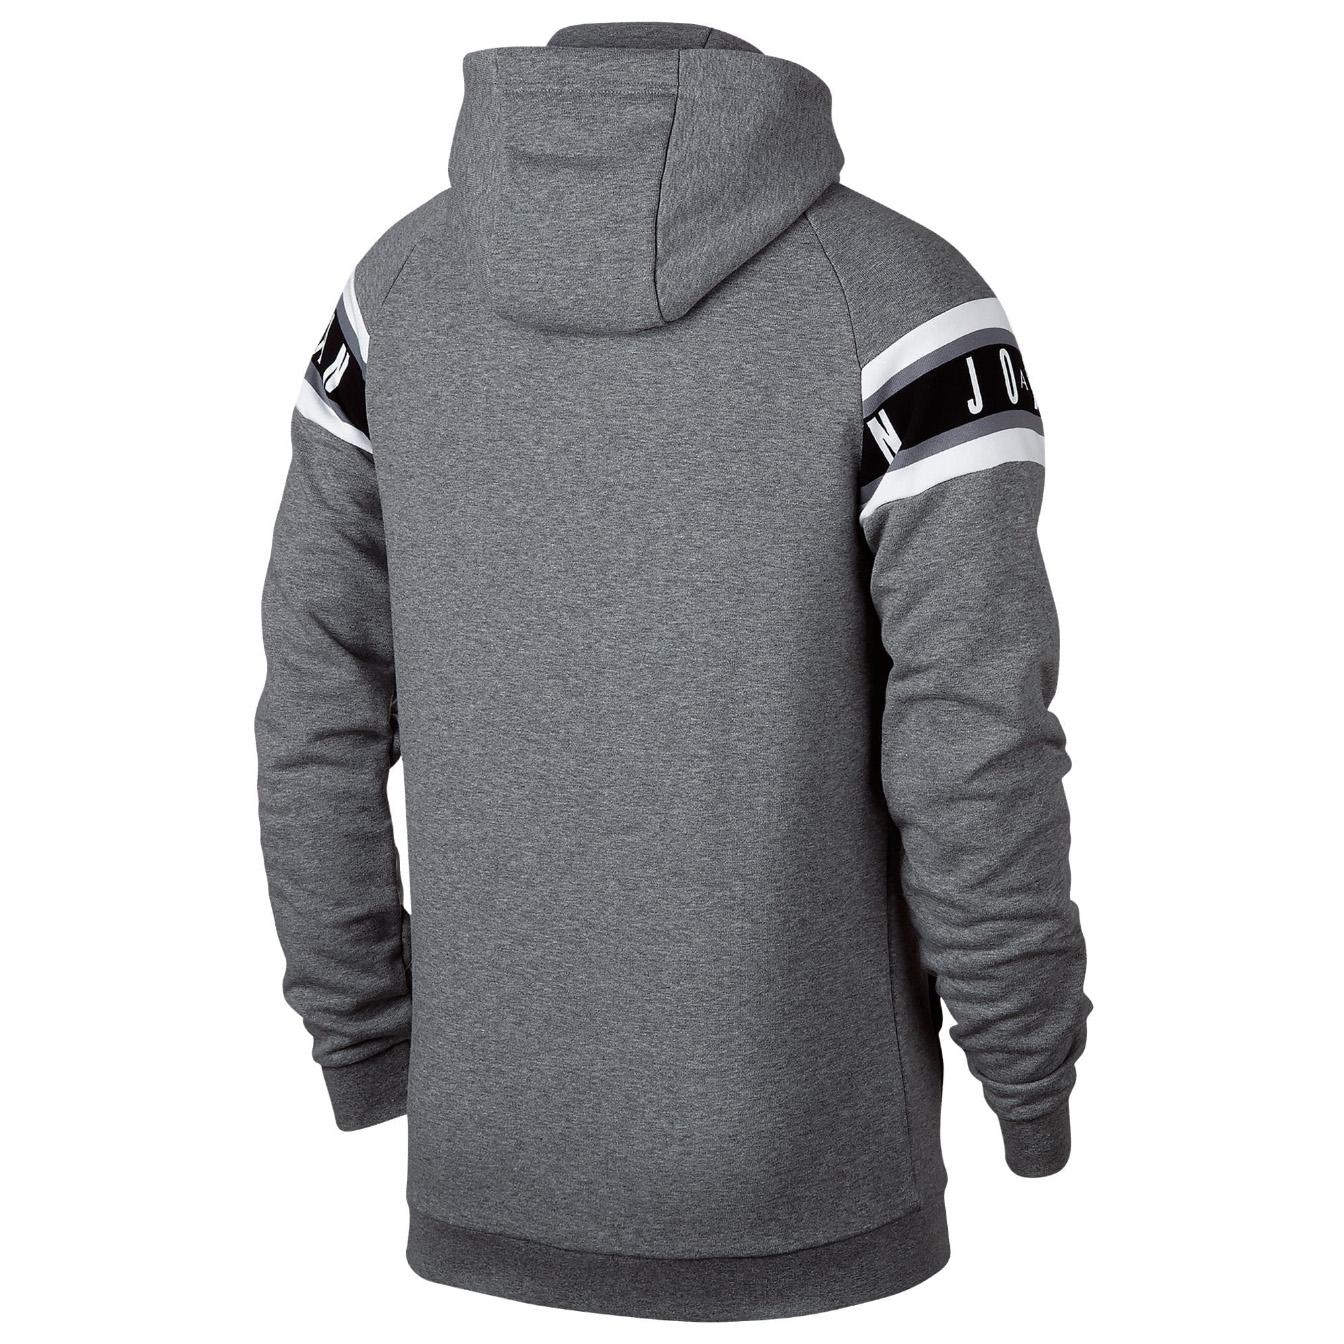 c3ec9f2f8cf8 Details about JORDAN Jumpman Air HBR Full-Zip Hoodie Sweatshirt Sweat Shirt  jumper fleece